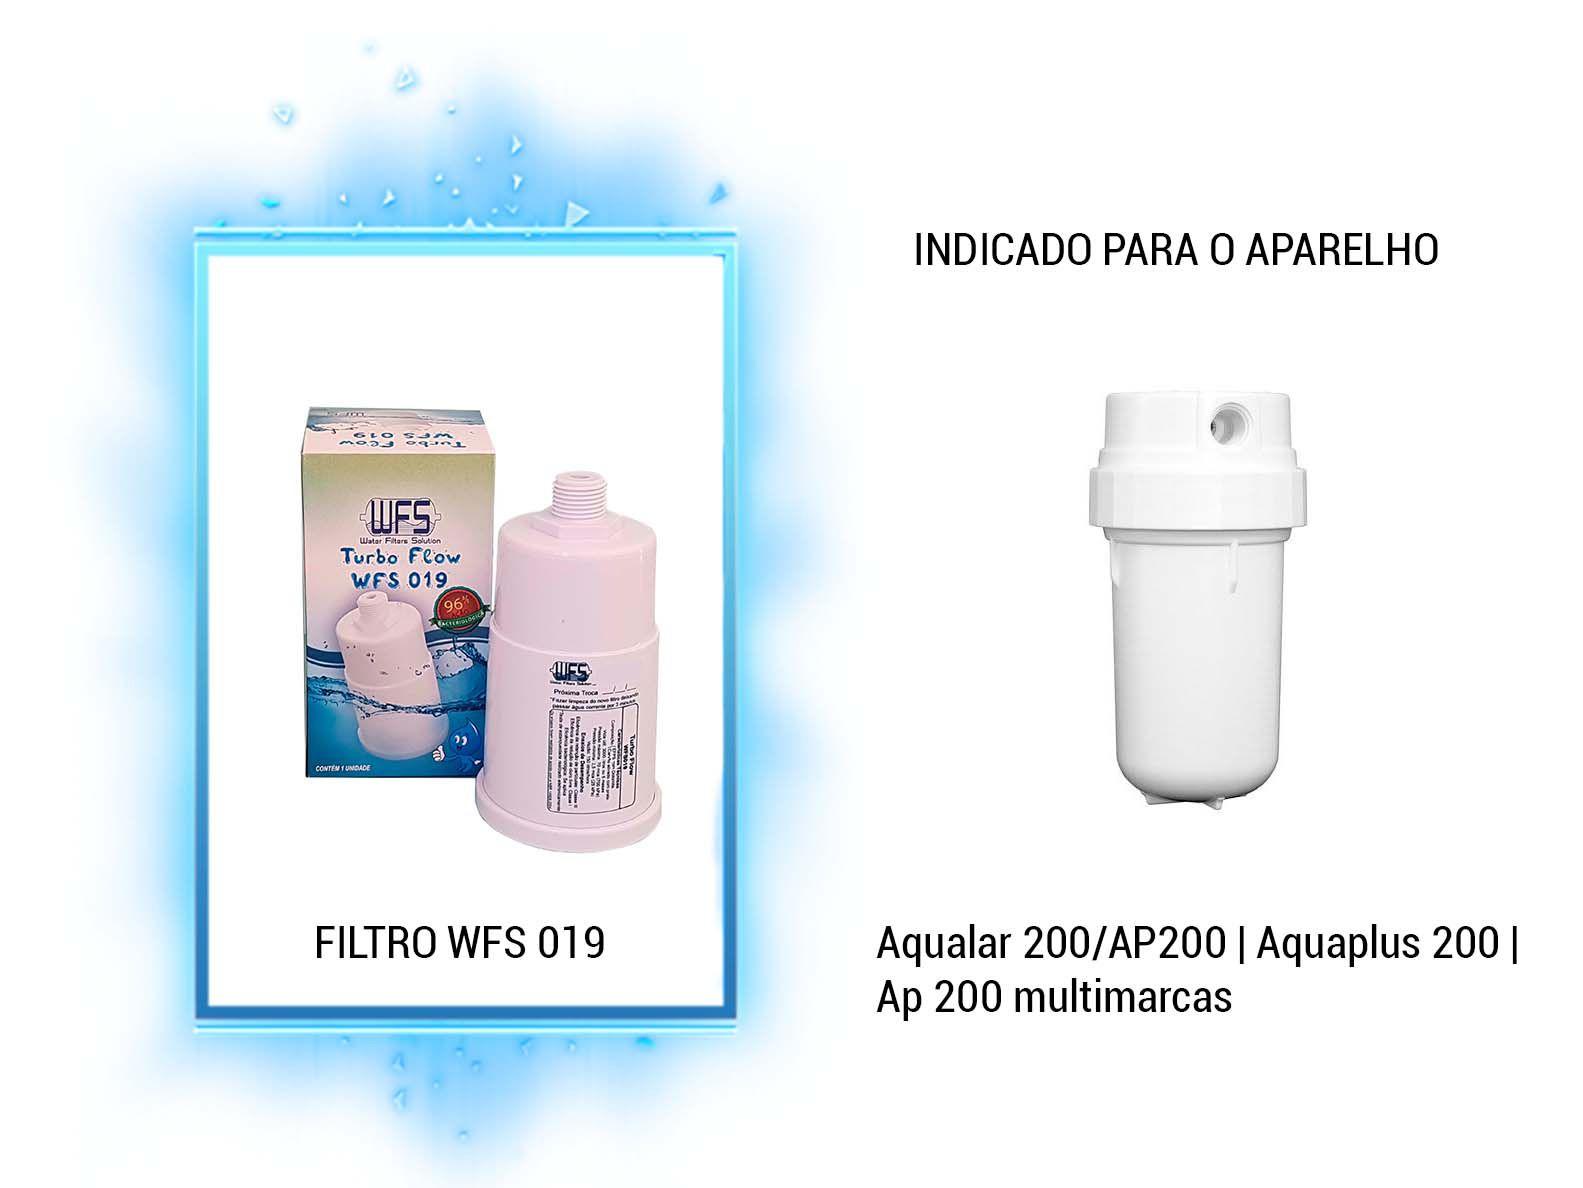 Refil Purificador Aqualar 200/ap200| Wfs 019 | Turbo Flow